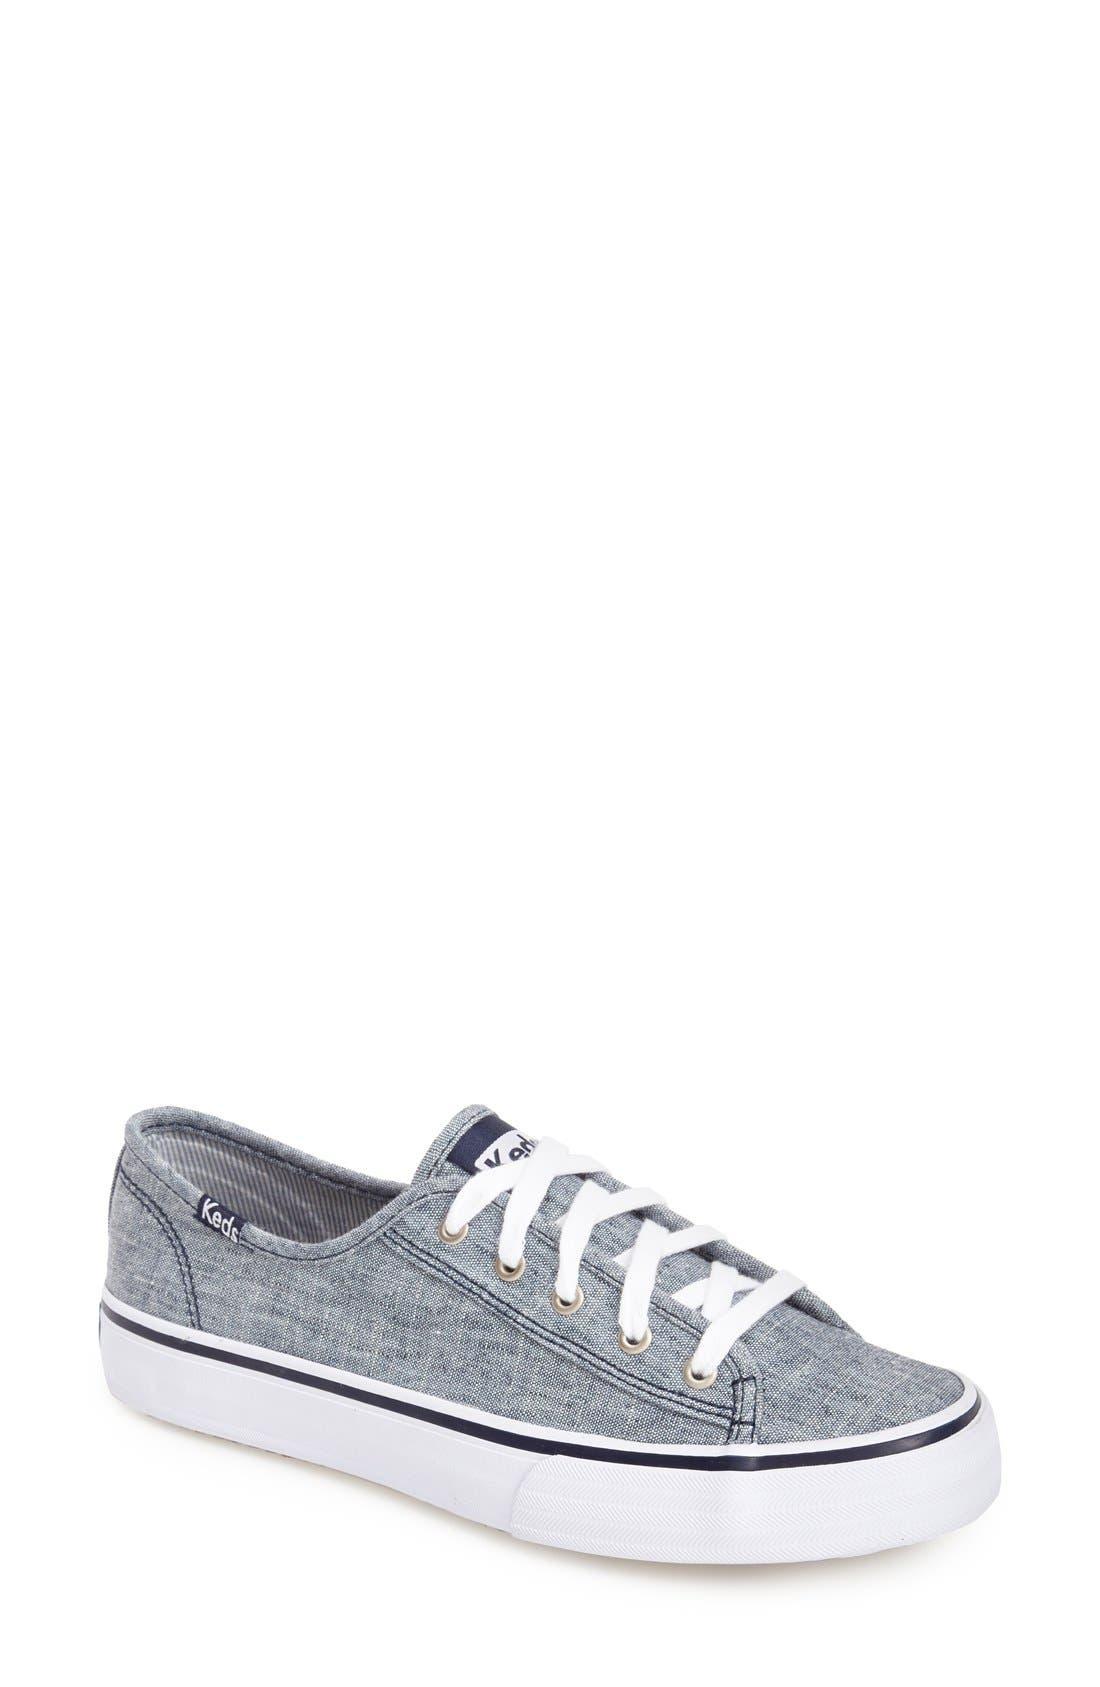 Main Image - Keds® 'Double Up - Linen' Sneaker (Women)